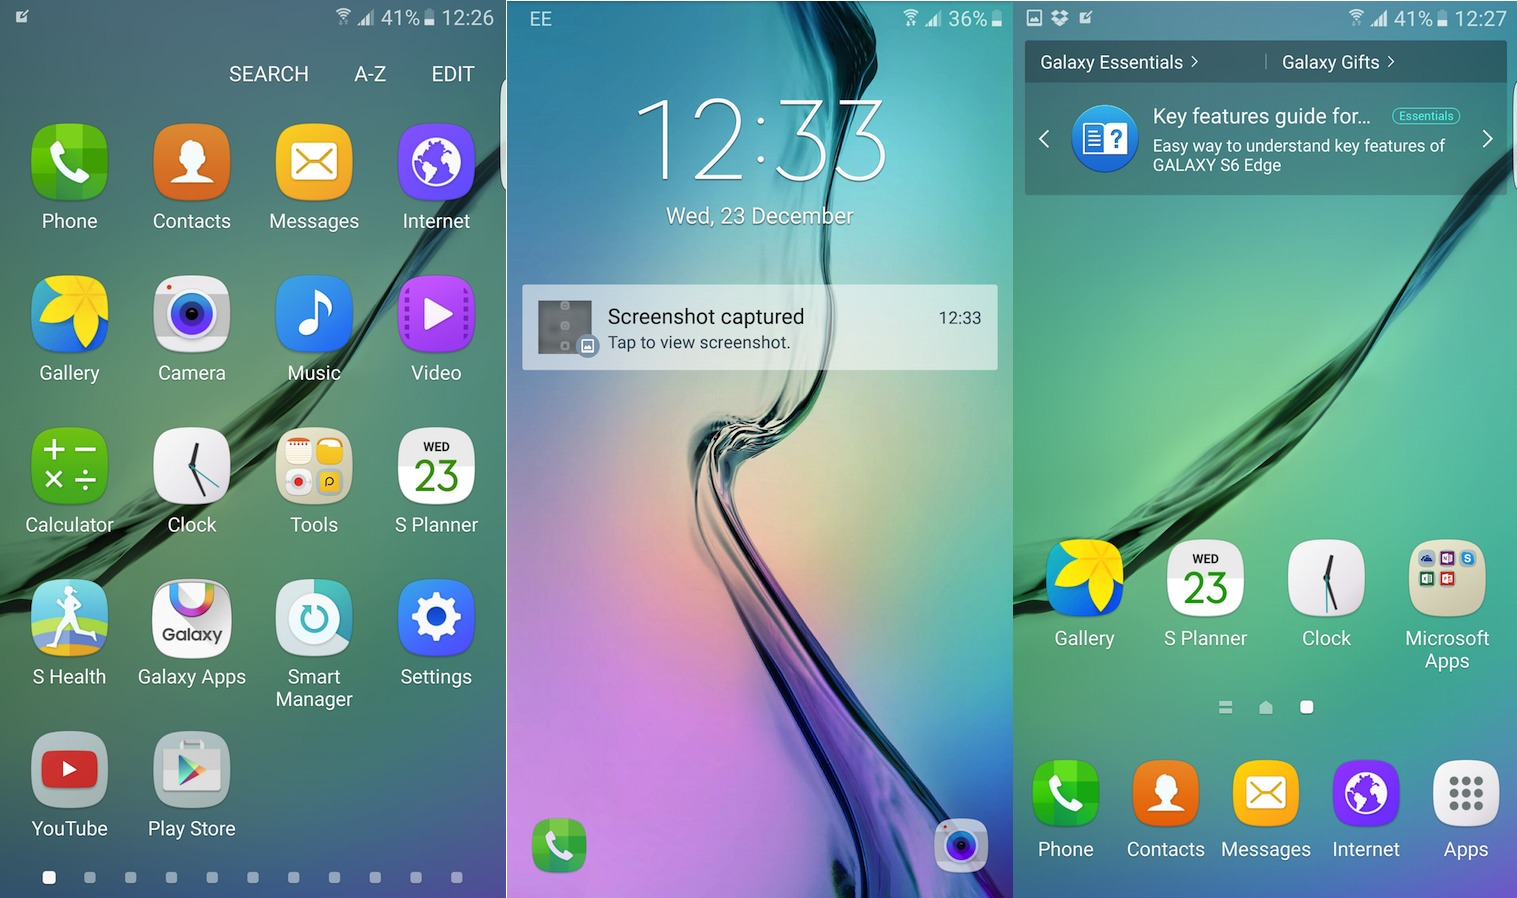 Galaxy S6 S6 edge Android 6.0 Marshmallow